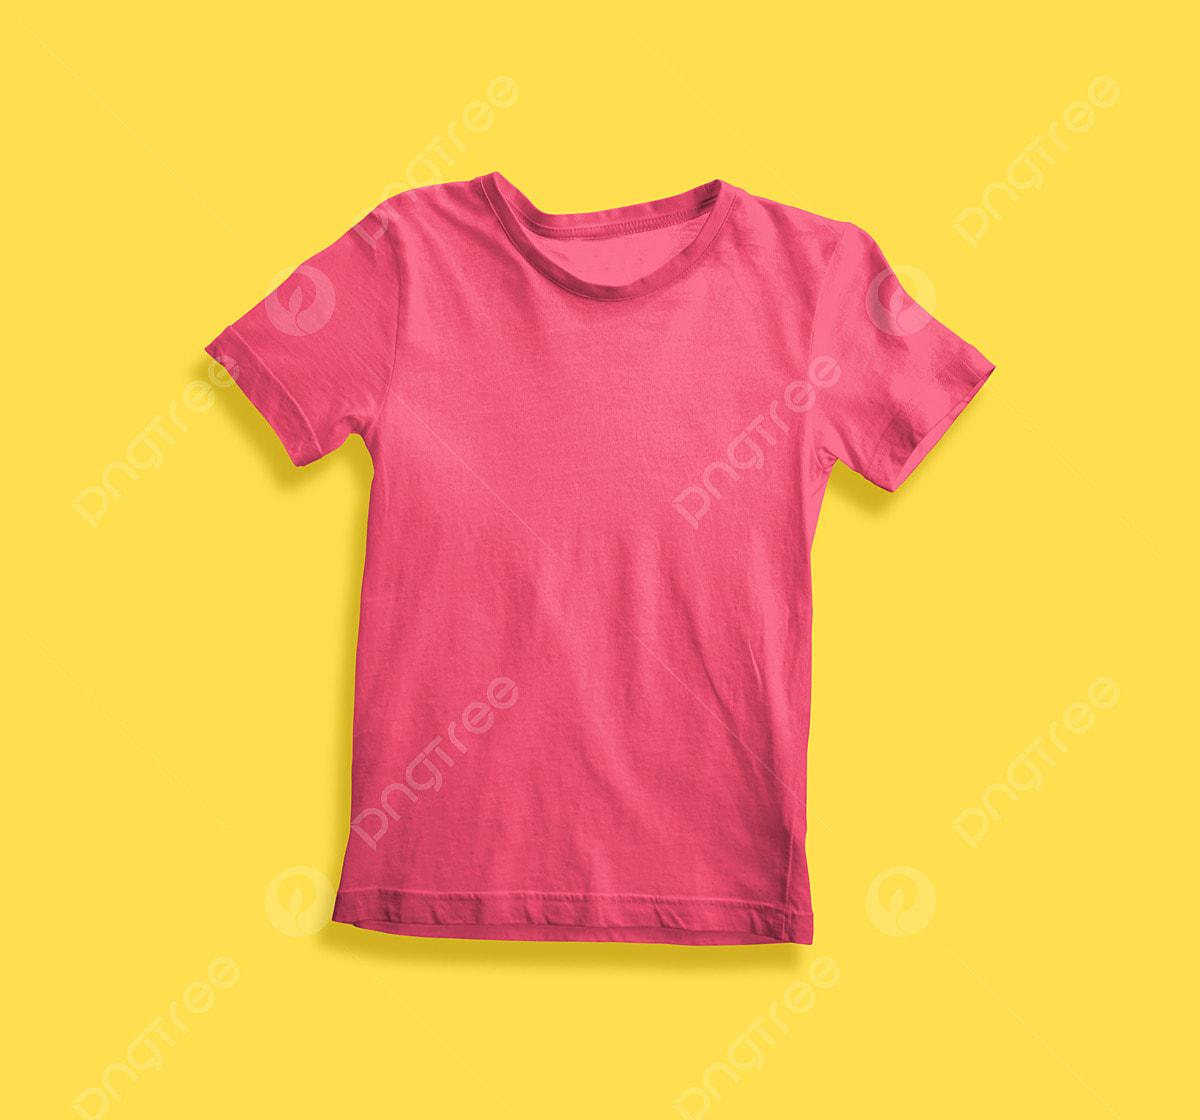 Rose Pink T Shirt For Kids Mockup T Shirts Mens White Png